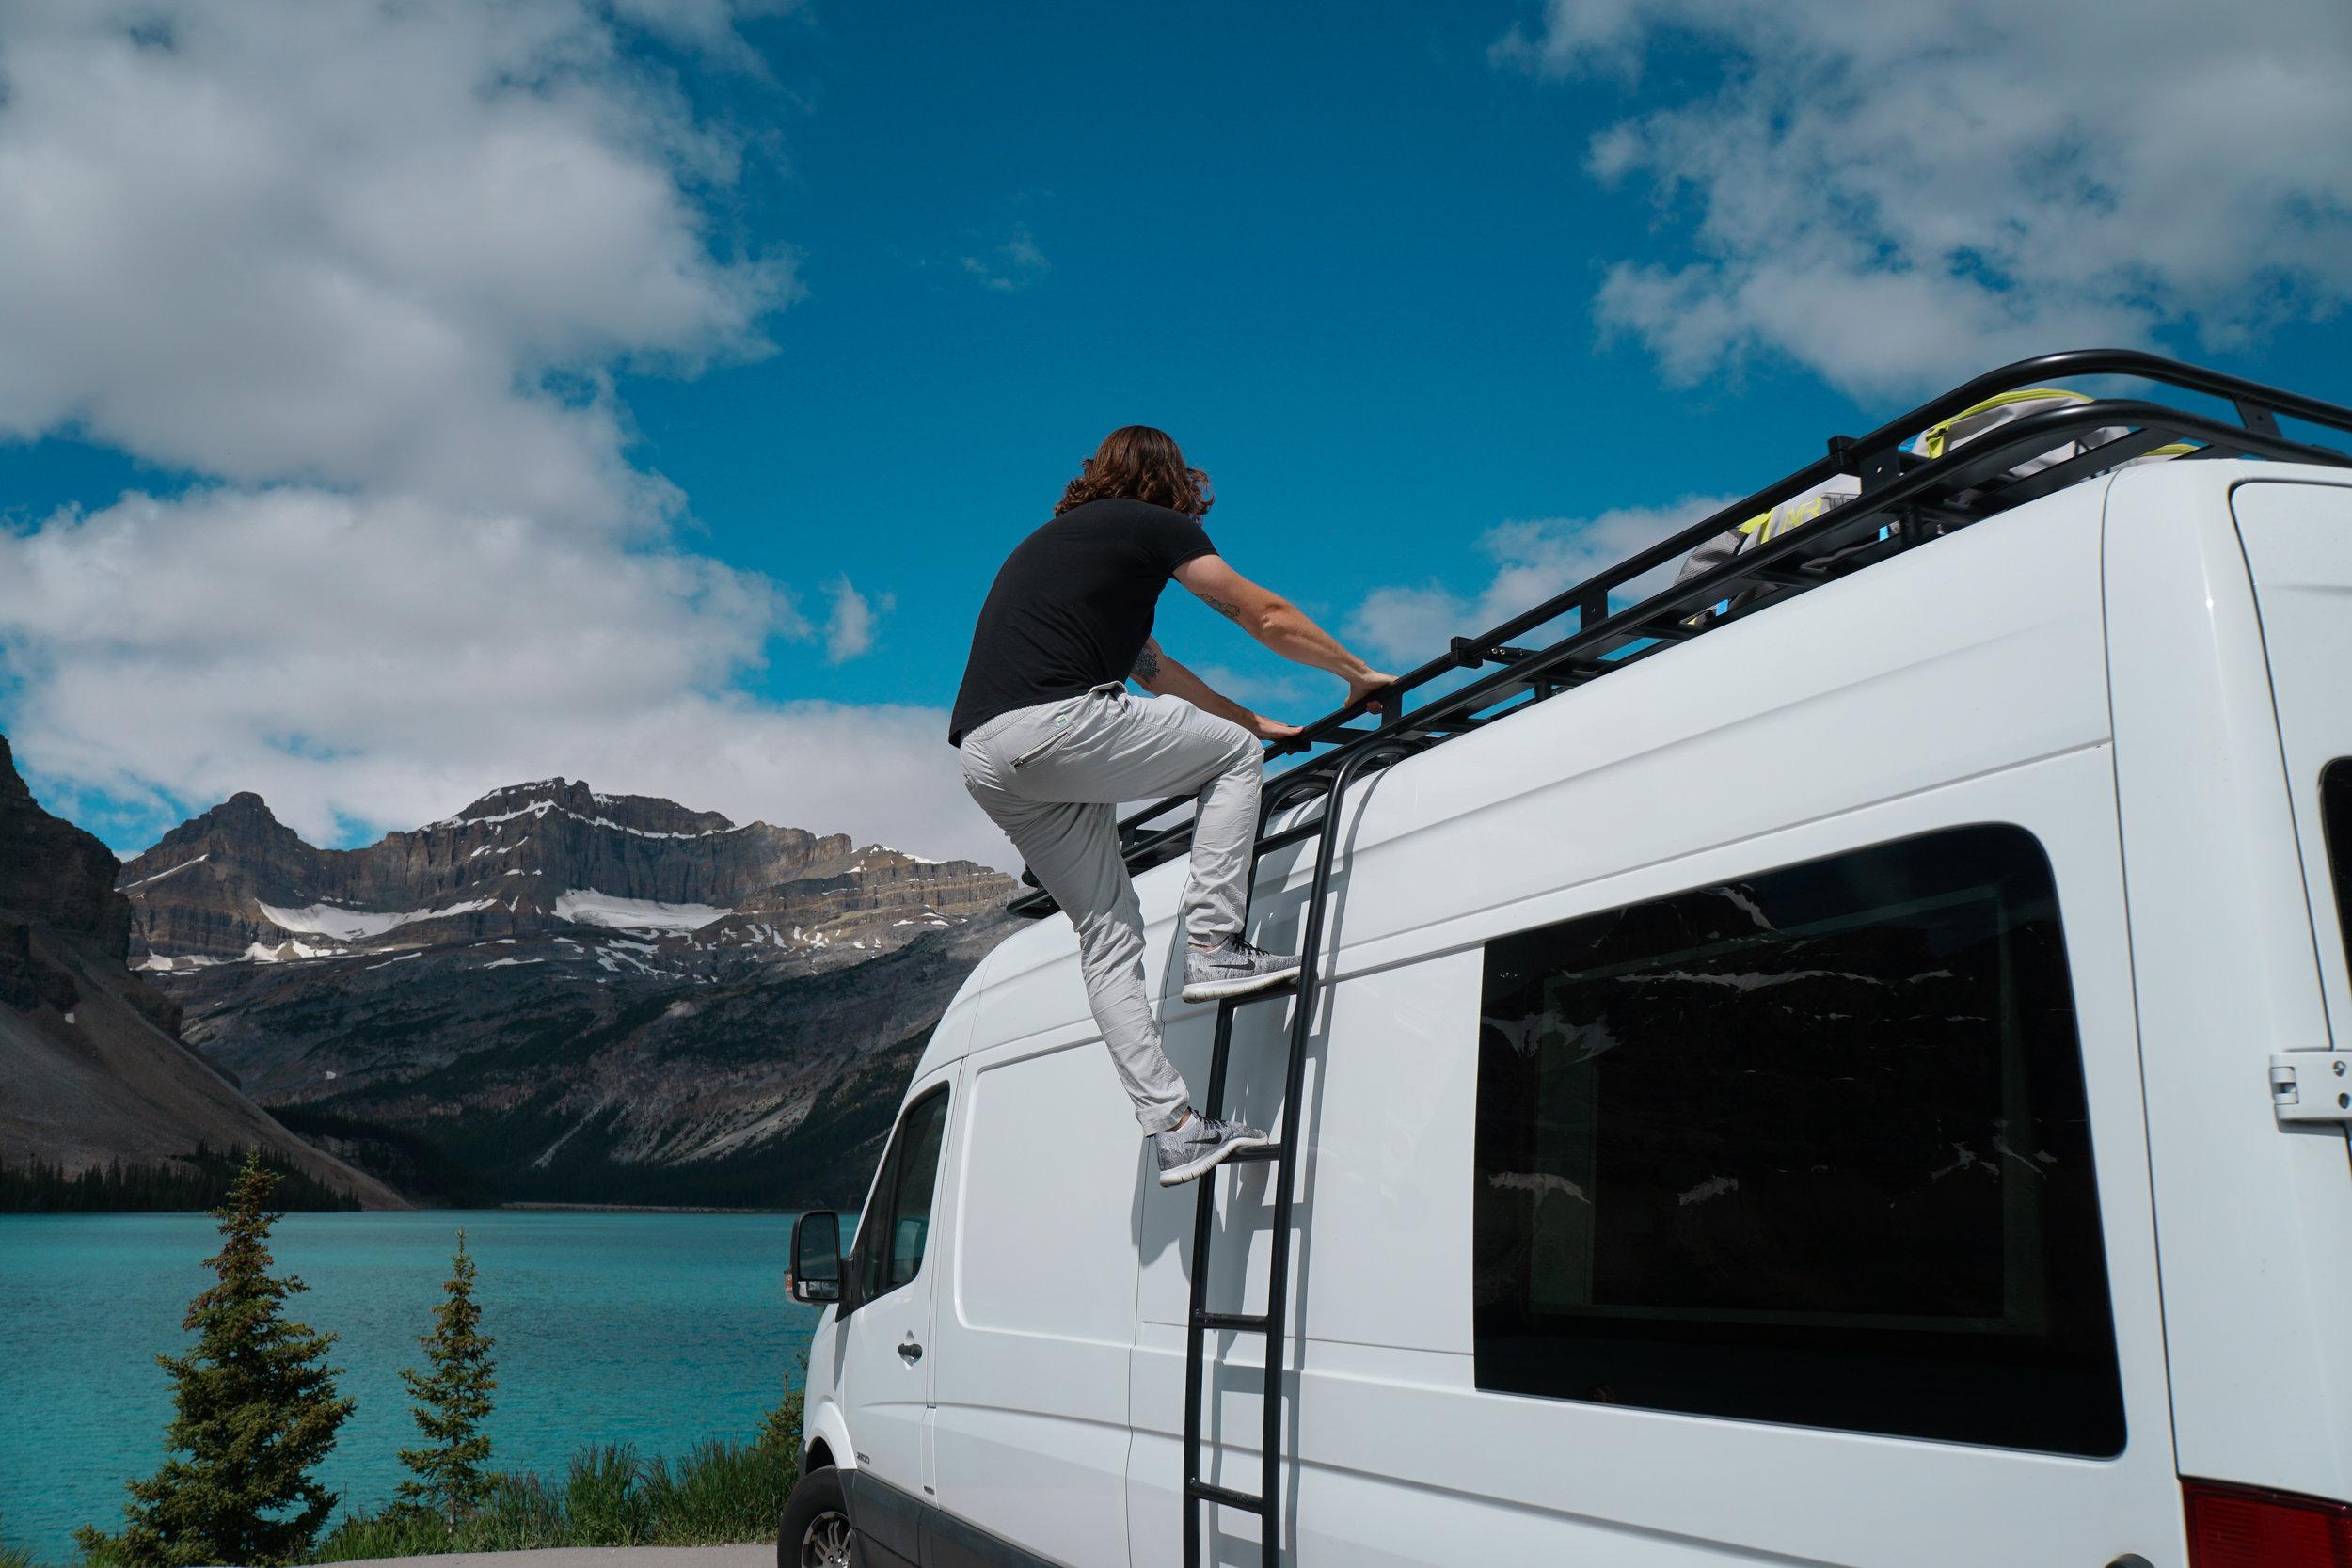 vanlife mercedes sprinter van conversion solar panels mount aluminess rack 40 hours of freedom